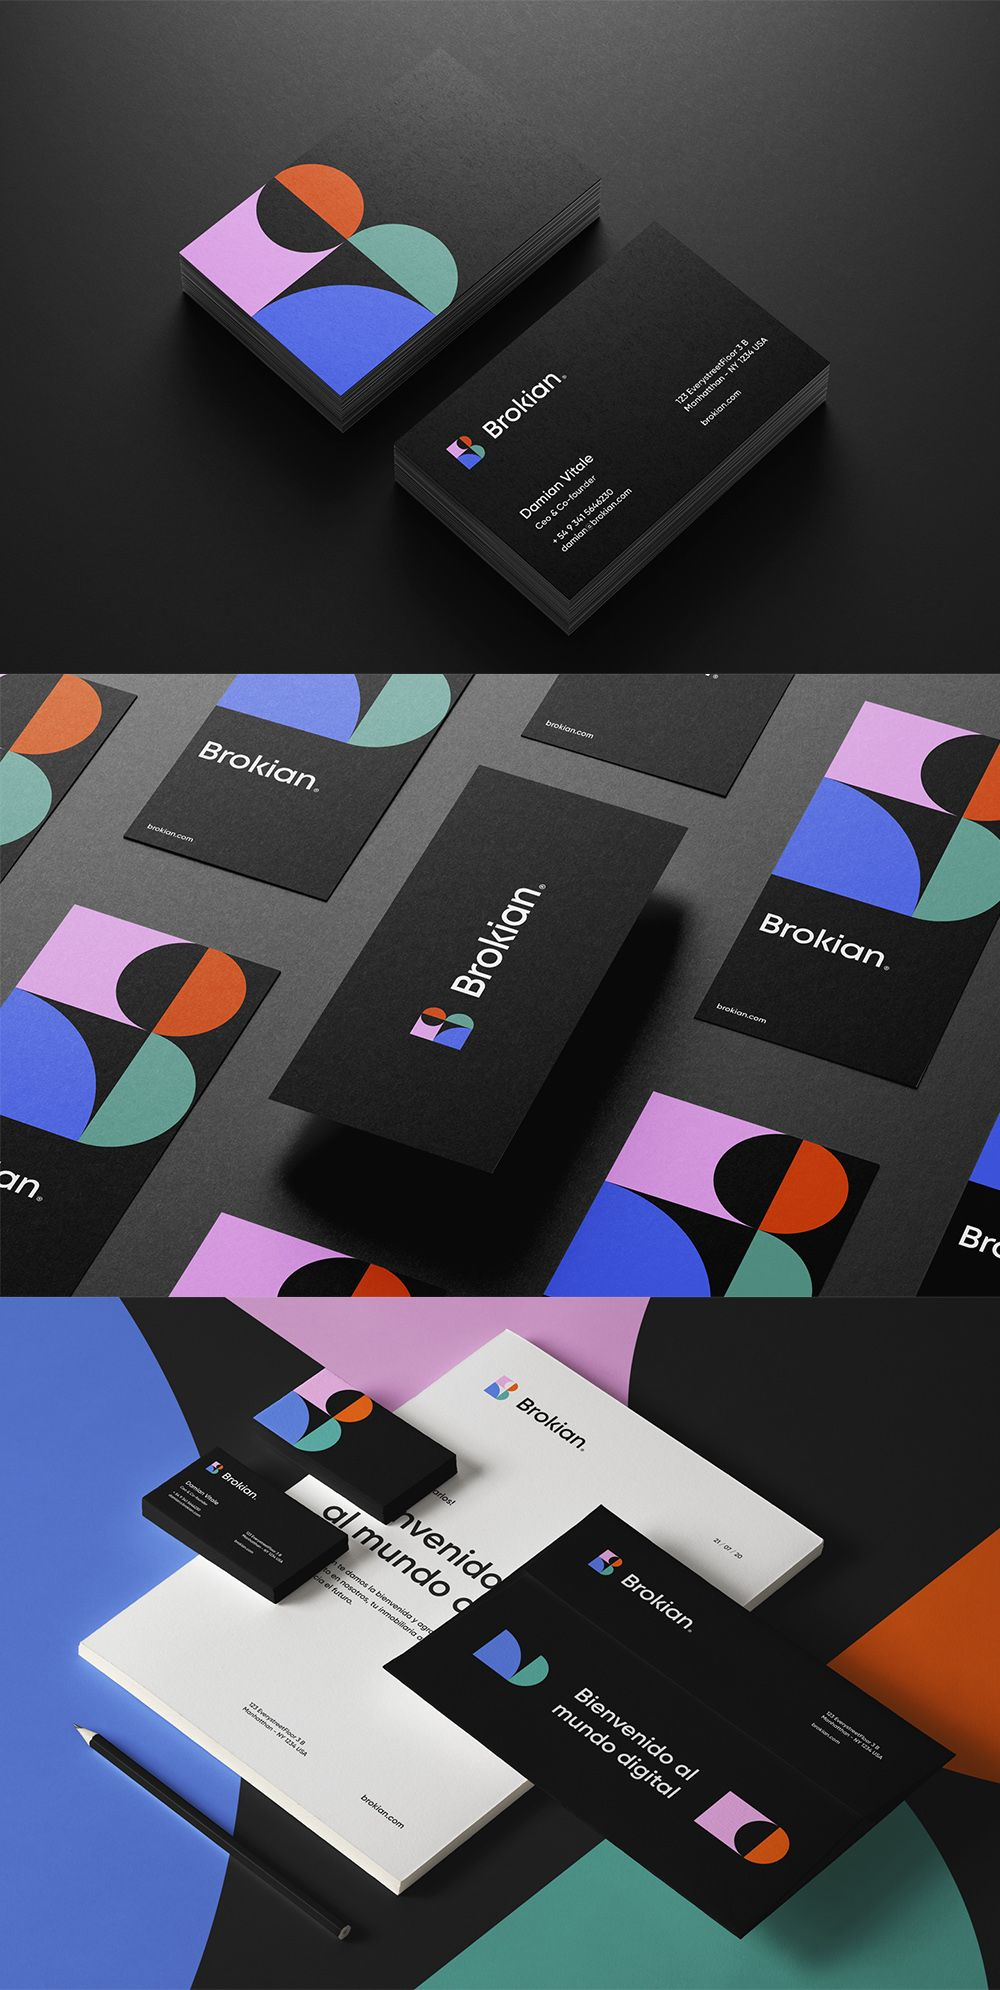 Brokian Business Card Business Card Design Inspiration In 2021 Business Card Design Modern Business Cards Business Card Design Inspiration